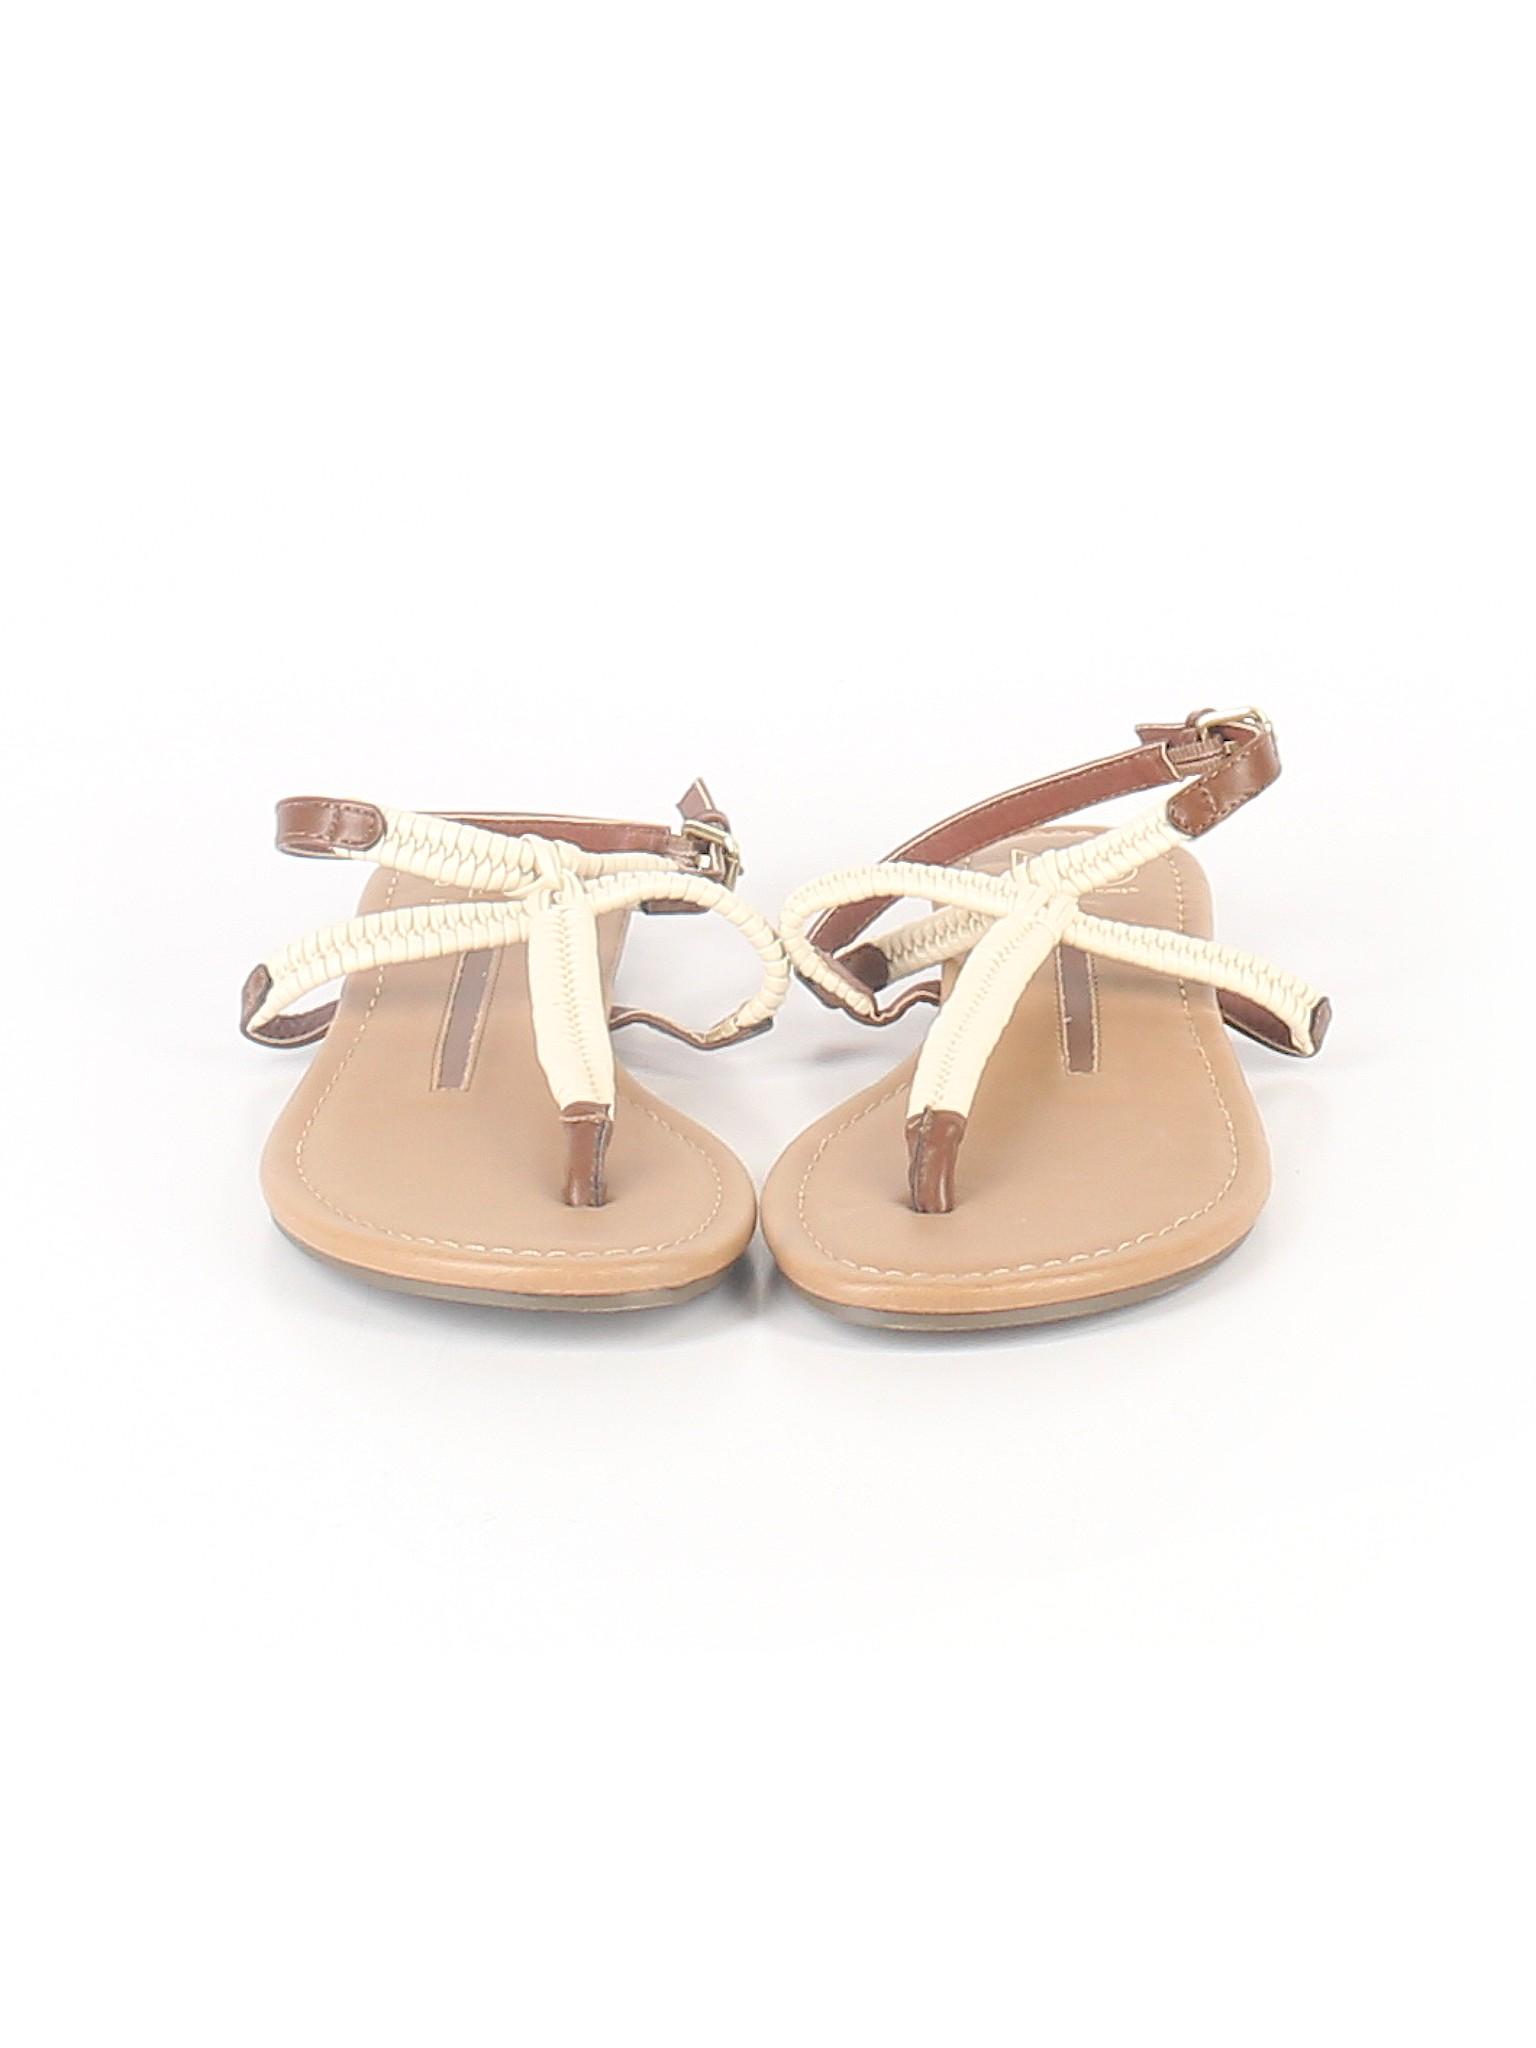 New Boutique Directions Sandals New Sandals Boutique promotion Boutique Directions promotion promotion New Boutique Directions promotion Sandals dFcqdYZA